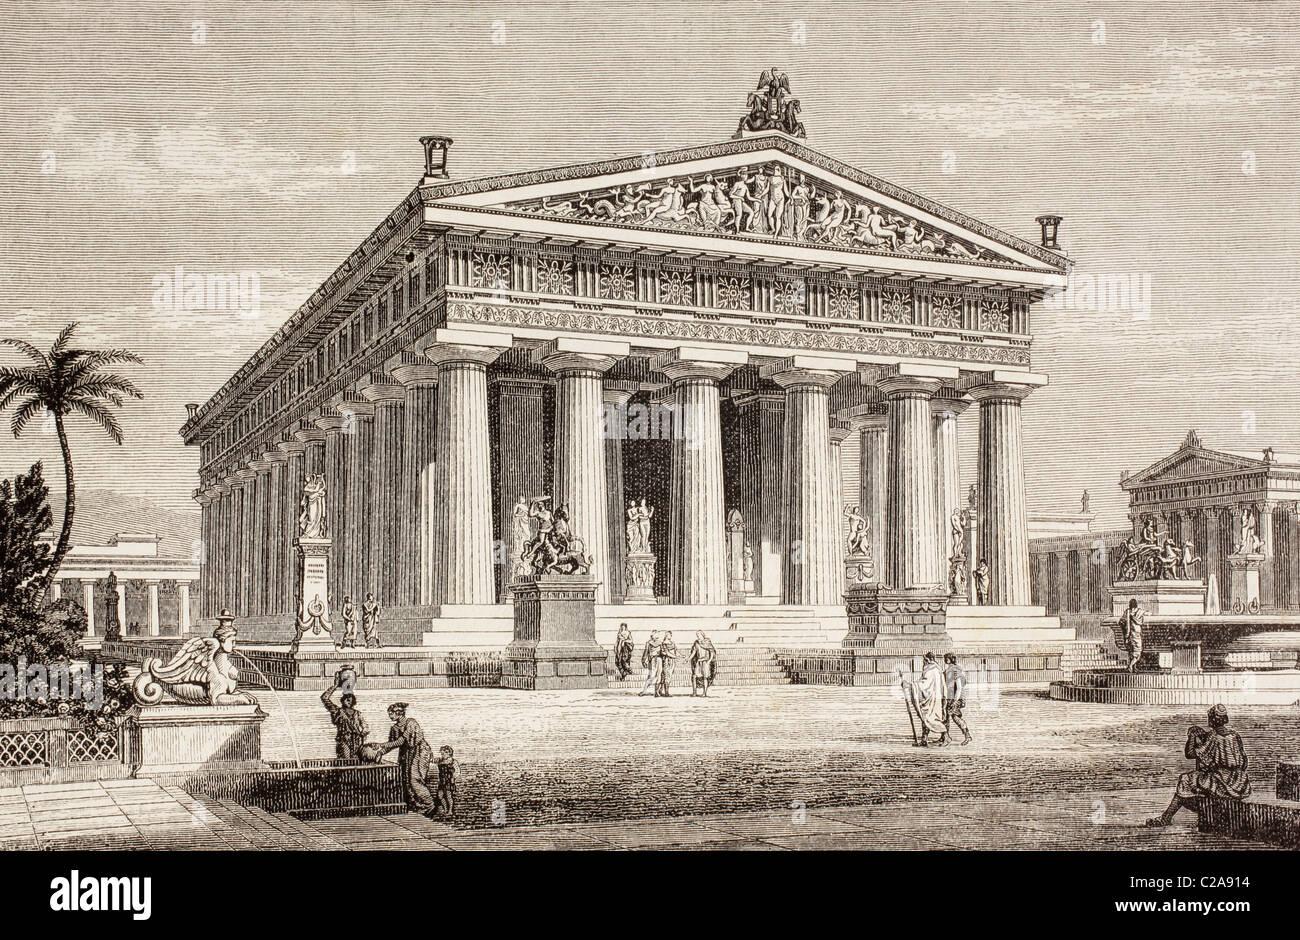 Impression d'artiste du Temple de Poséidon, ou Neptune, Paestum, Italie. Photo Stock